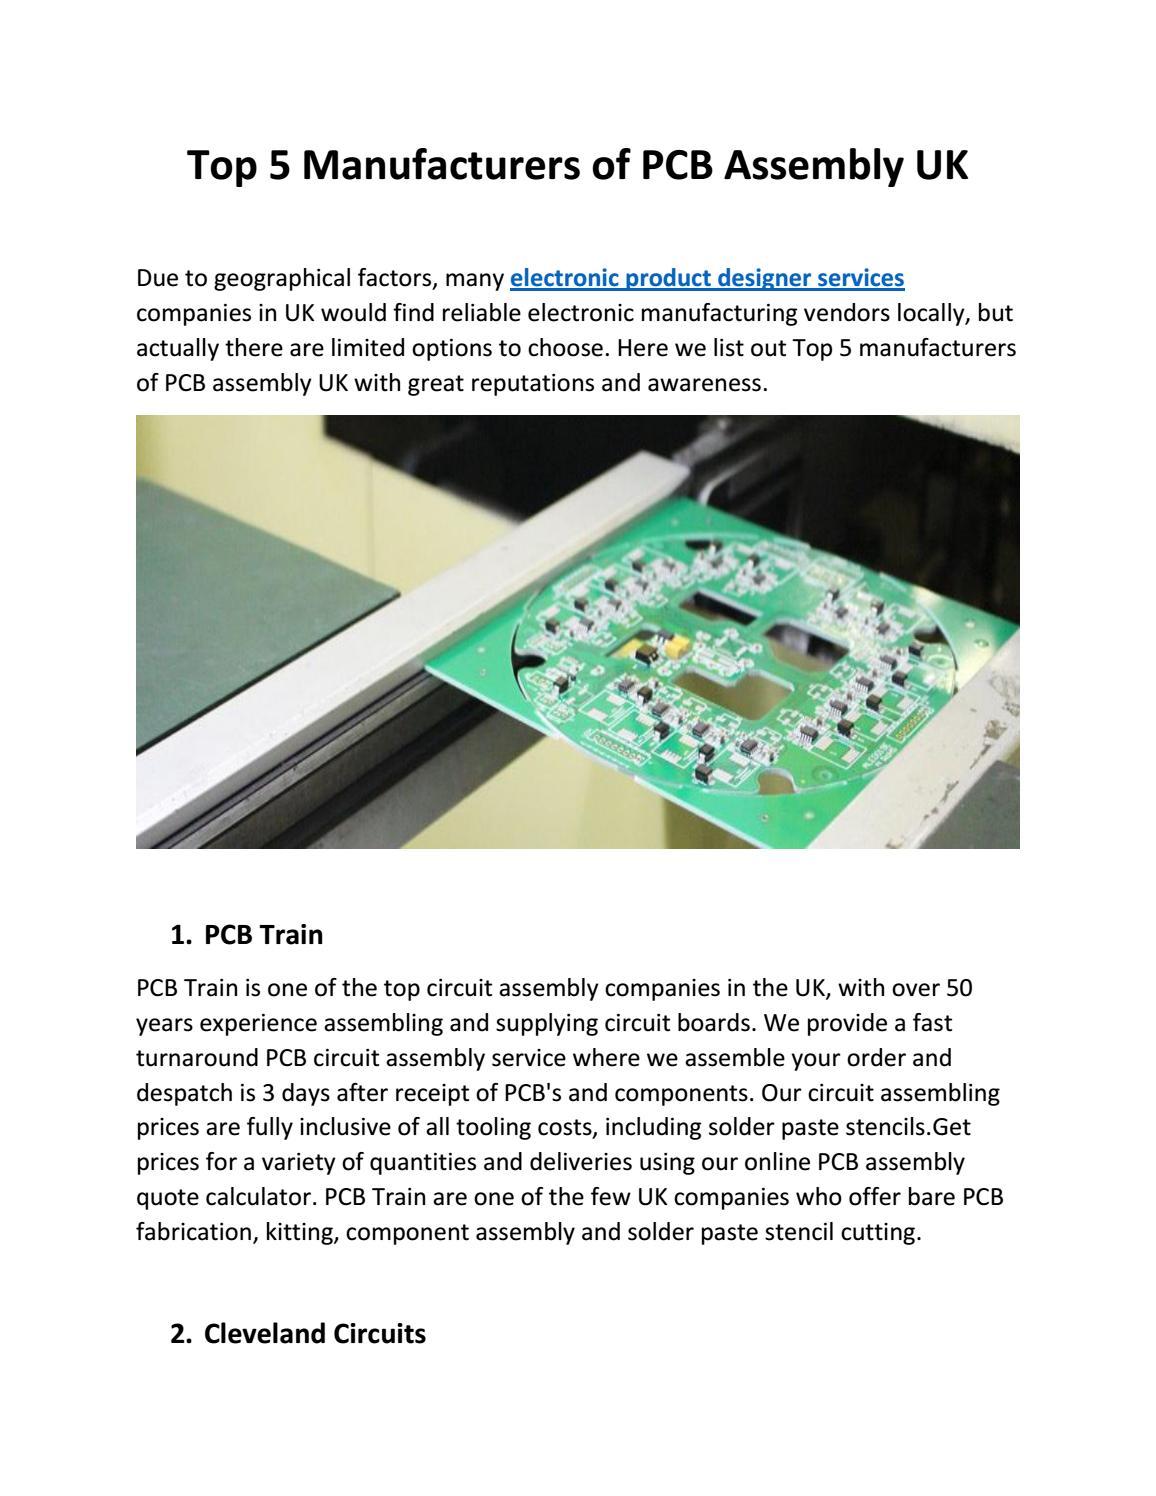 Top 5 Manufacturers Of Pcb Assembly Uk By Technosoftinnovations Issuu Wwwelectronicscircuitstk